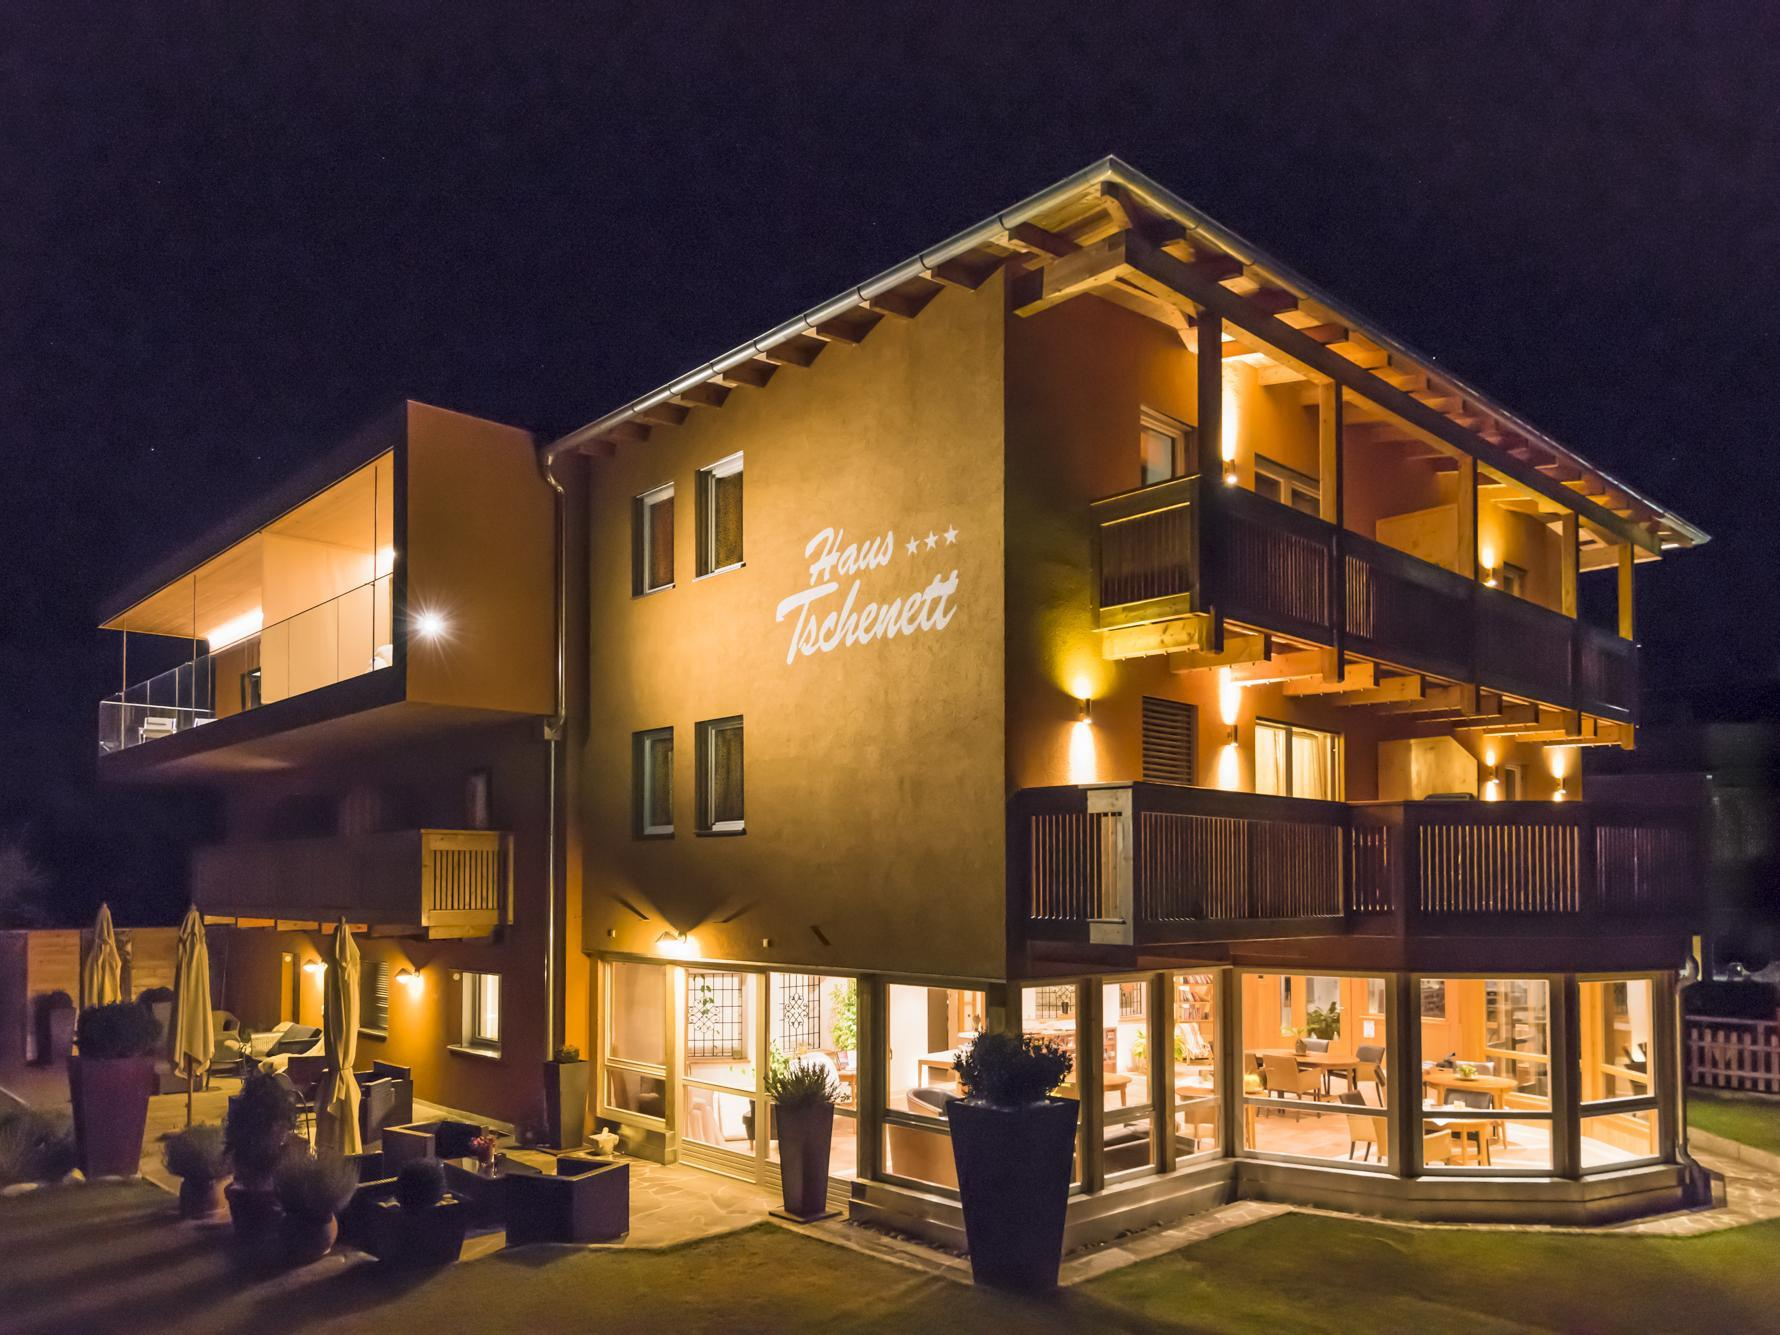 Residence Haus Tschenett